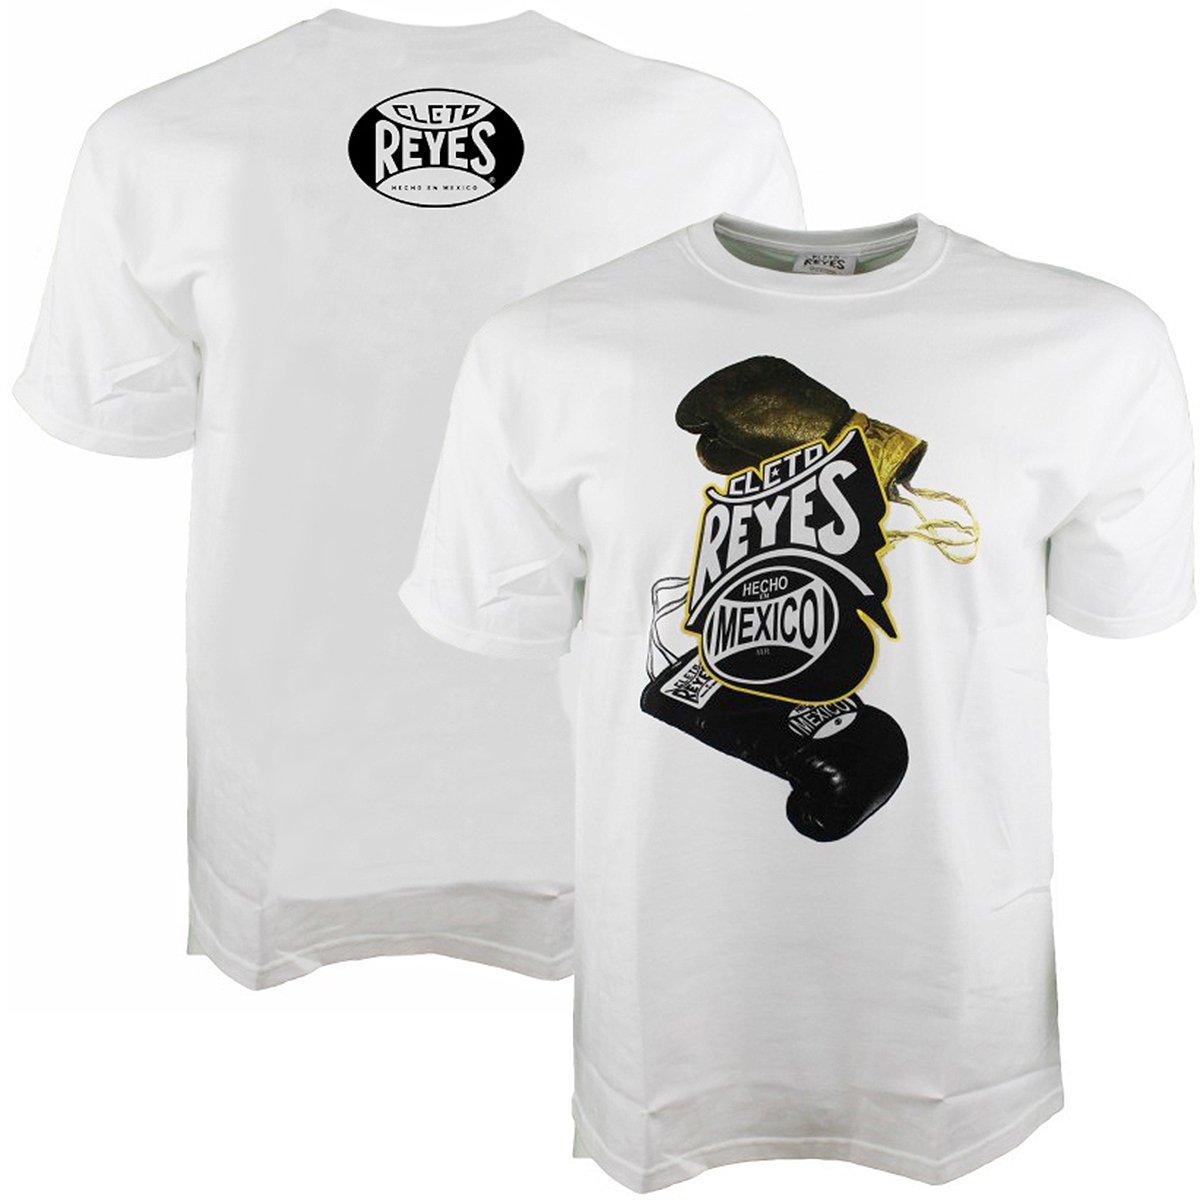 Cleto Reyes Printed Boxing Gloves T-Shirt White